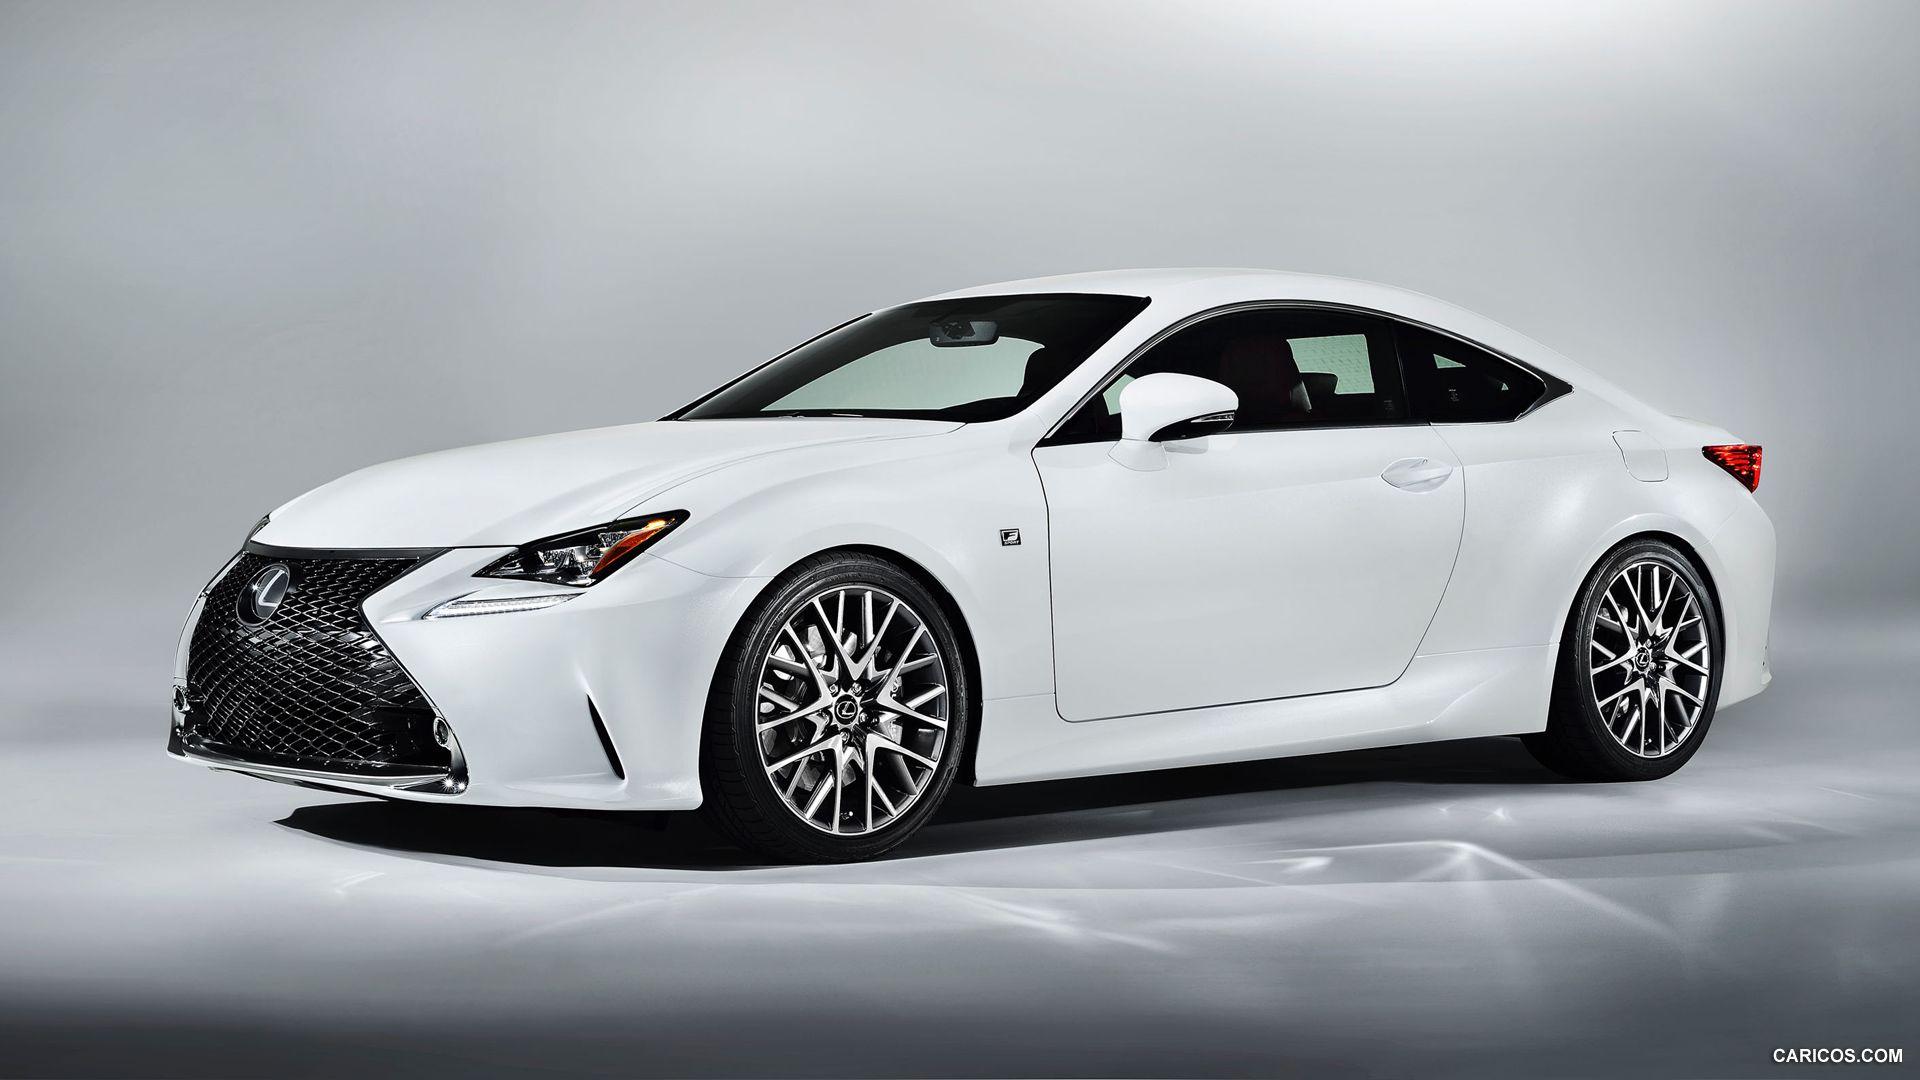 Lexus RC Lexus cars, New lexus, Sports car